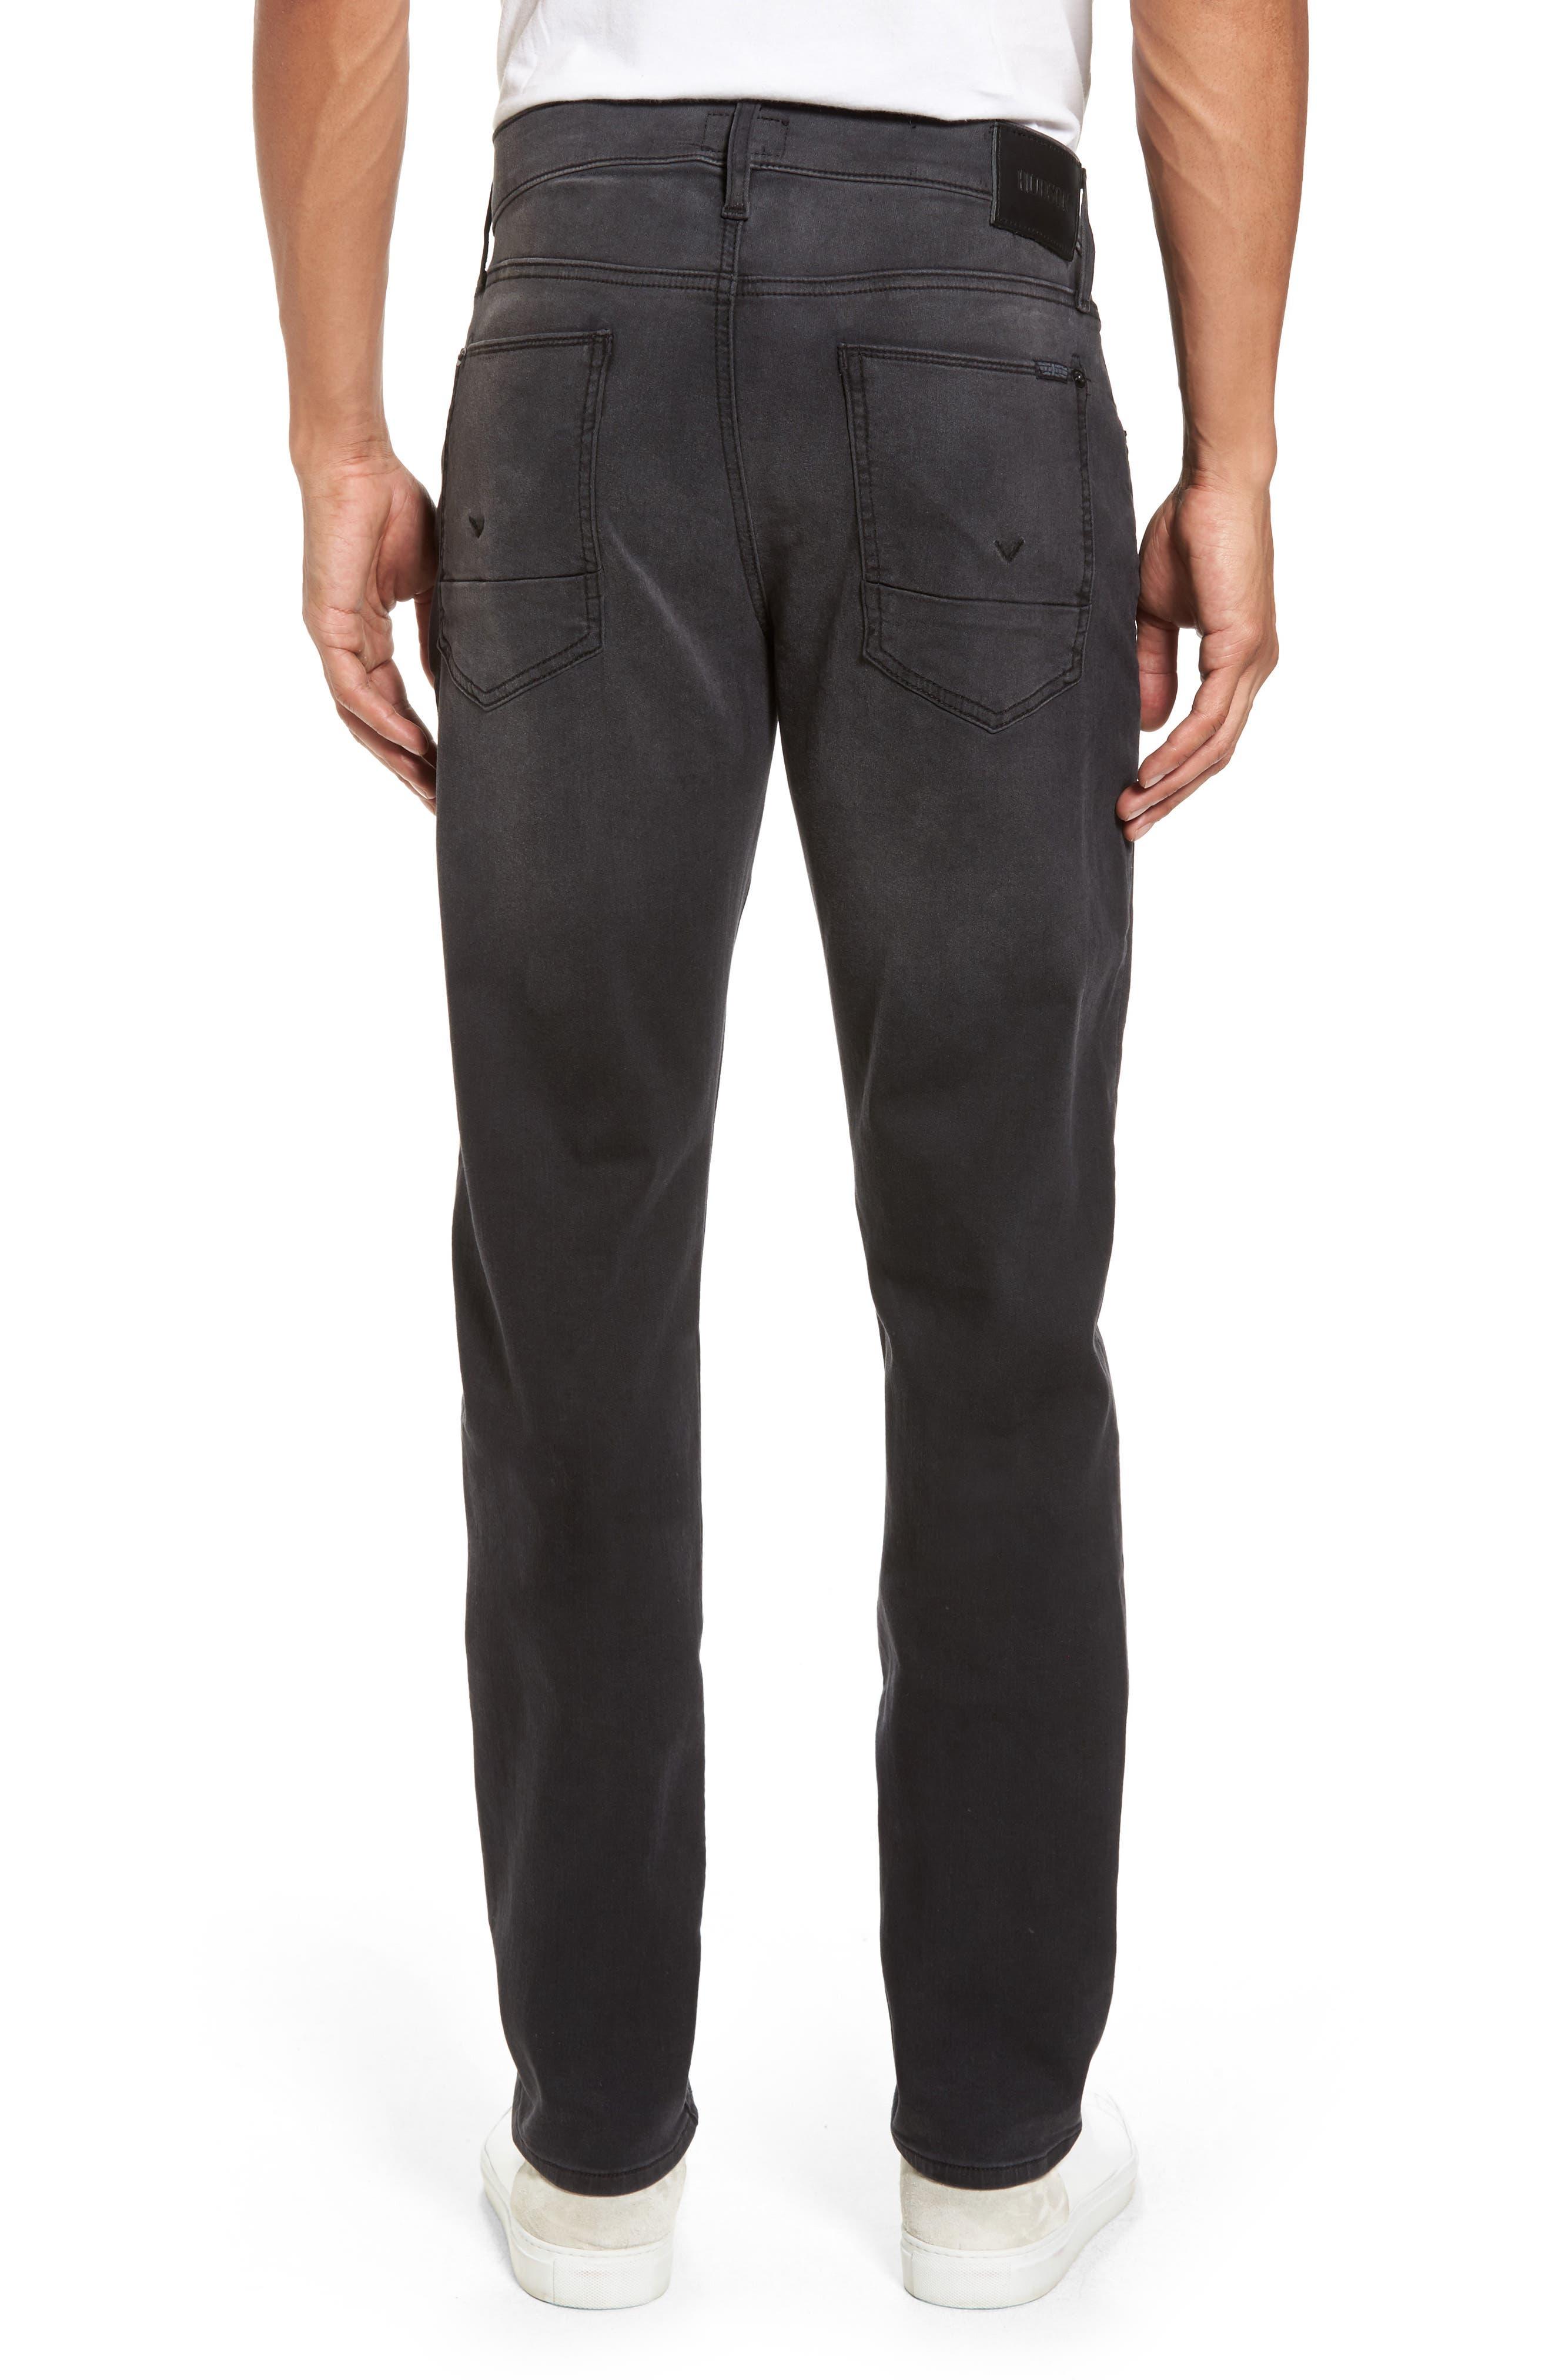 Blake Slim Fit Jeans,                             Alternate thumbnail 2, color,                             001